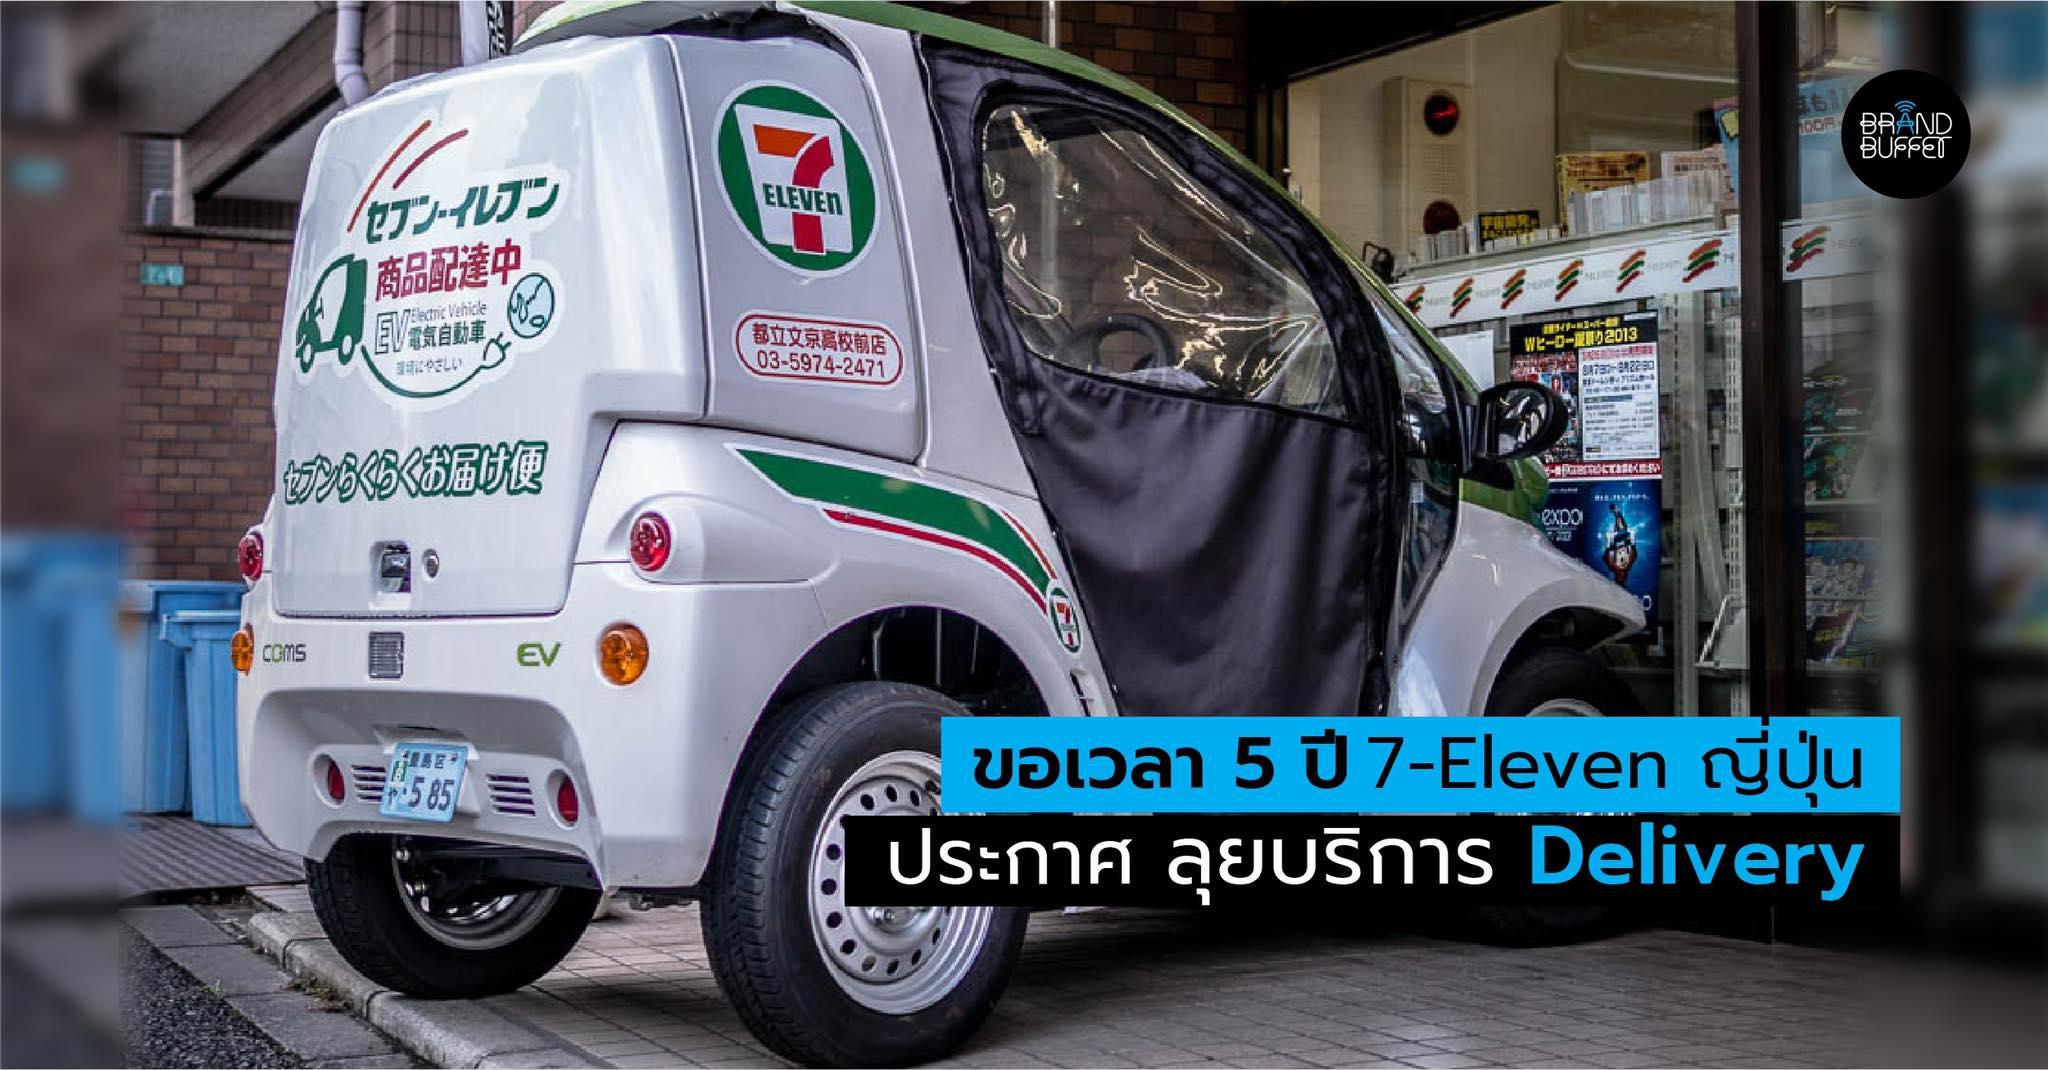 7-eleven japan delivery